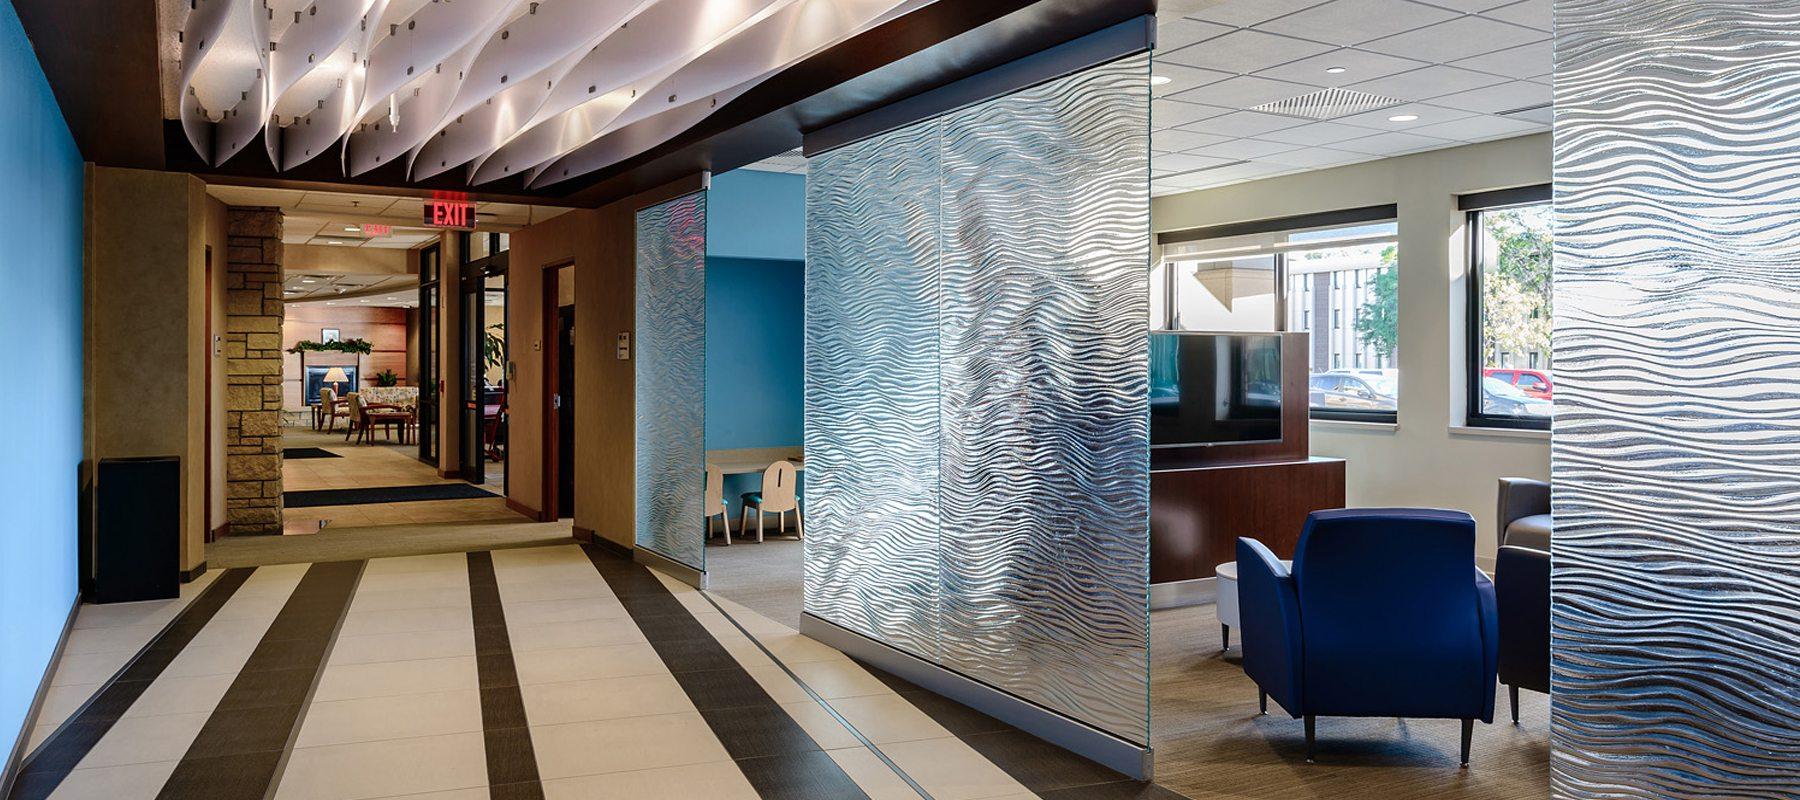 Decorative & Architectural Glass Suppliers